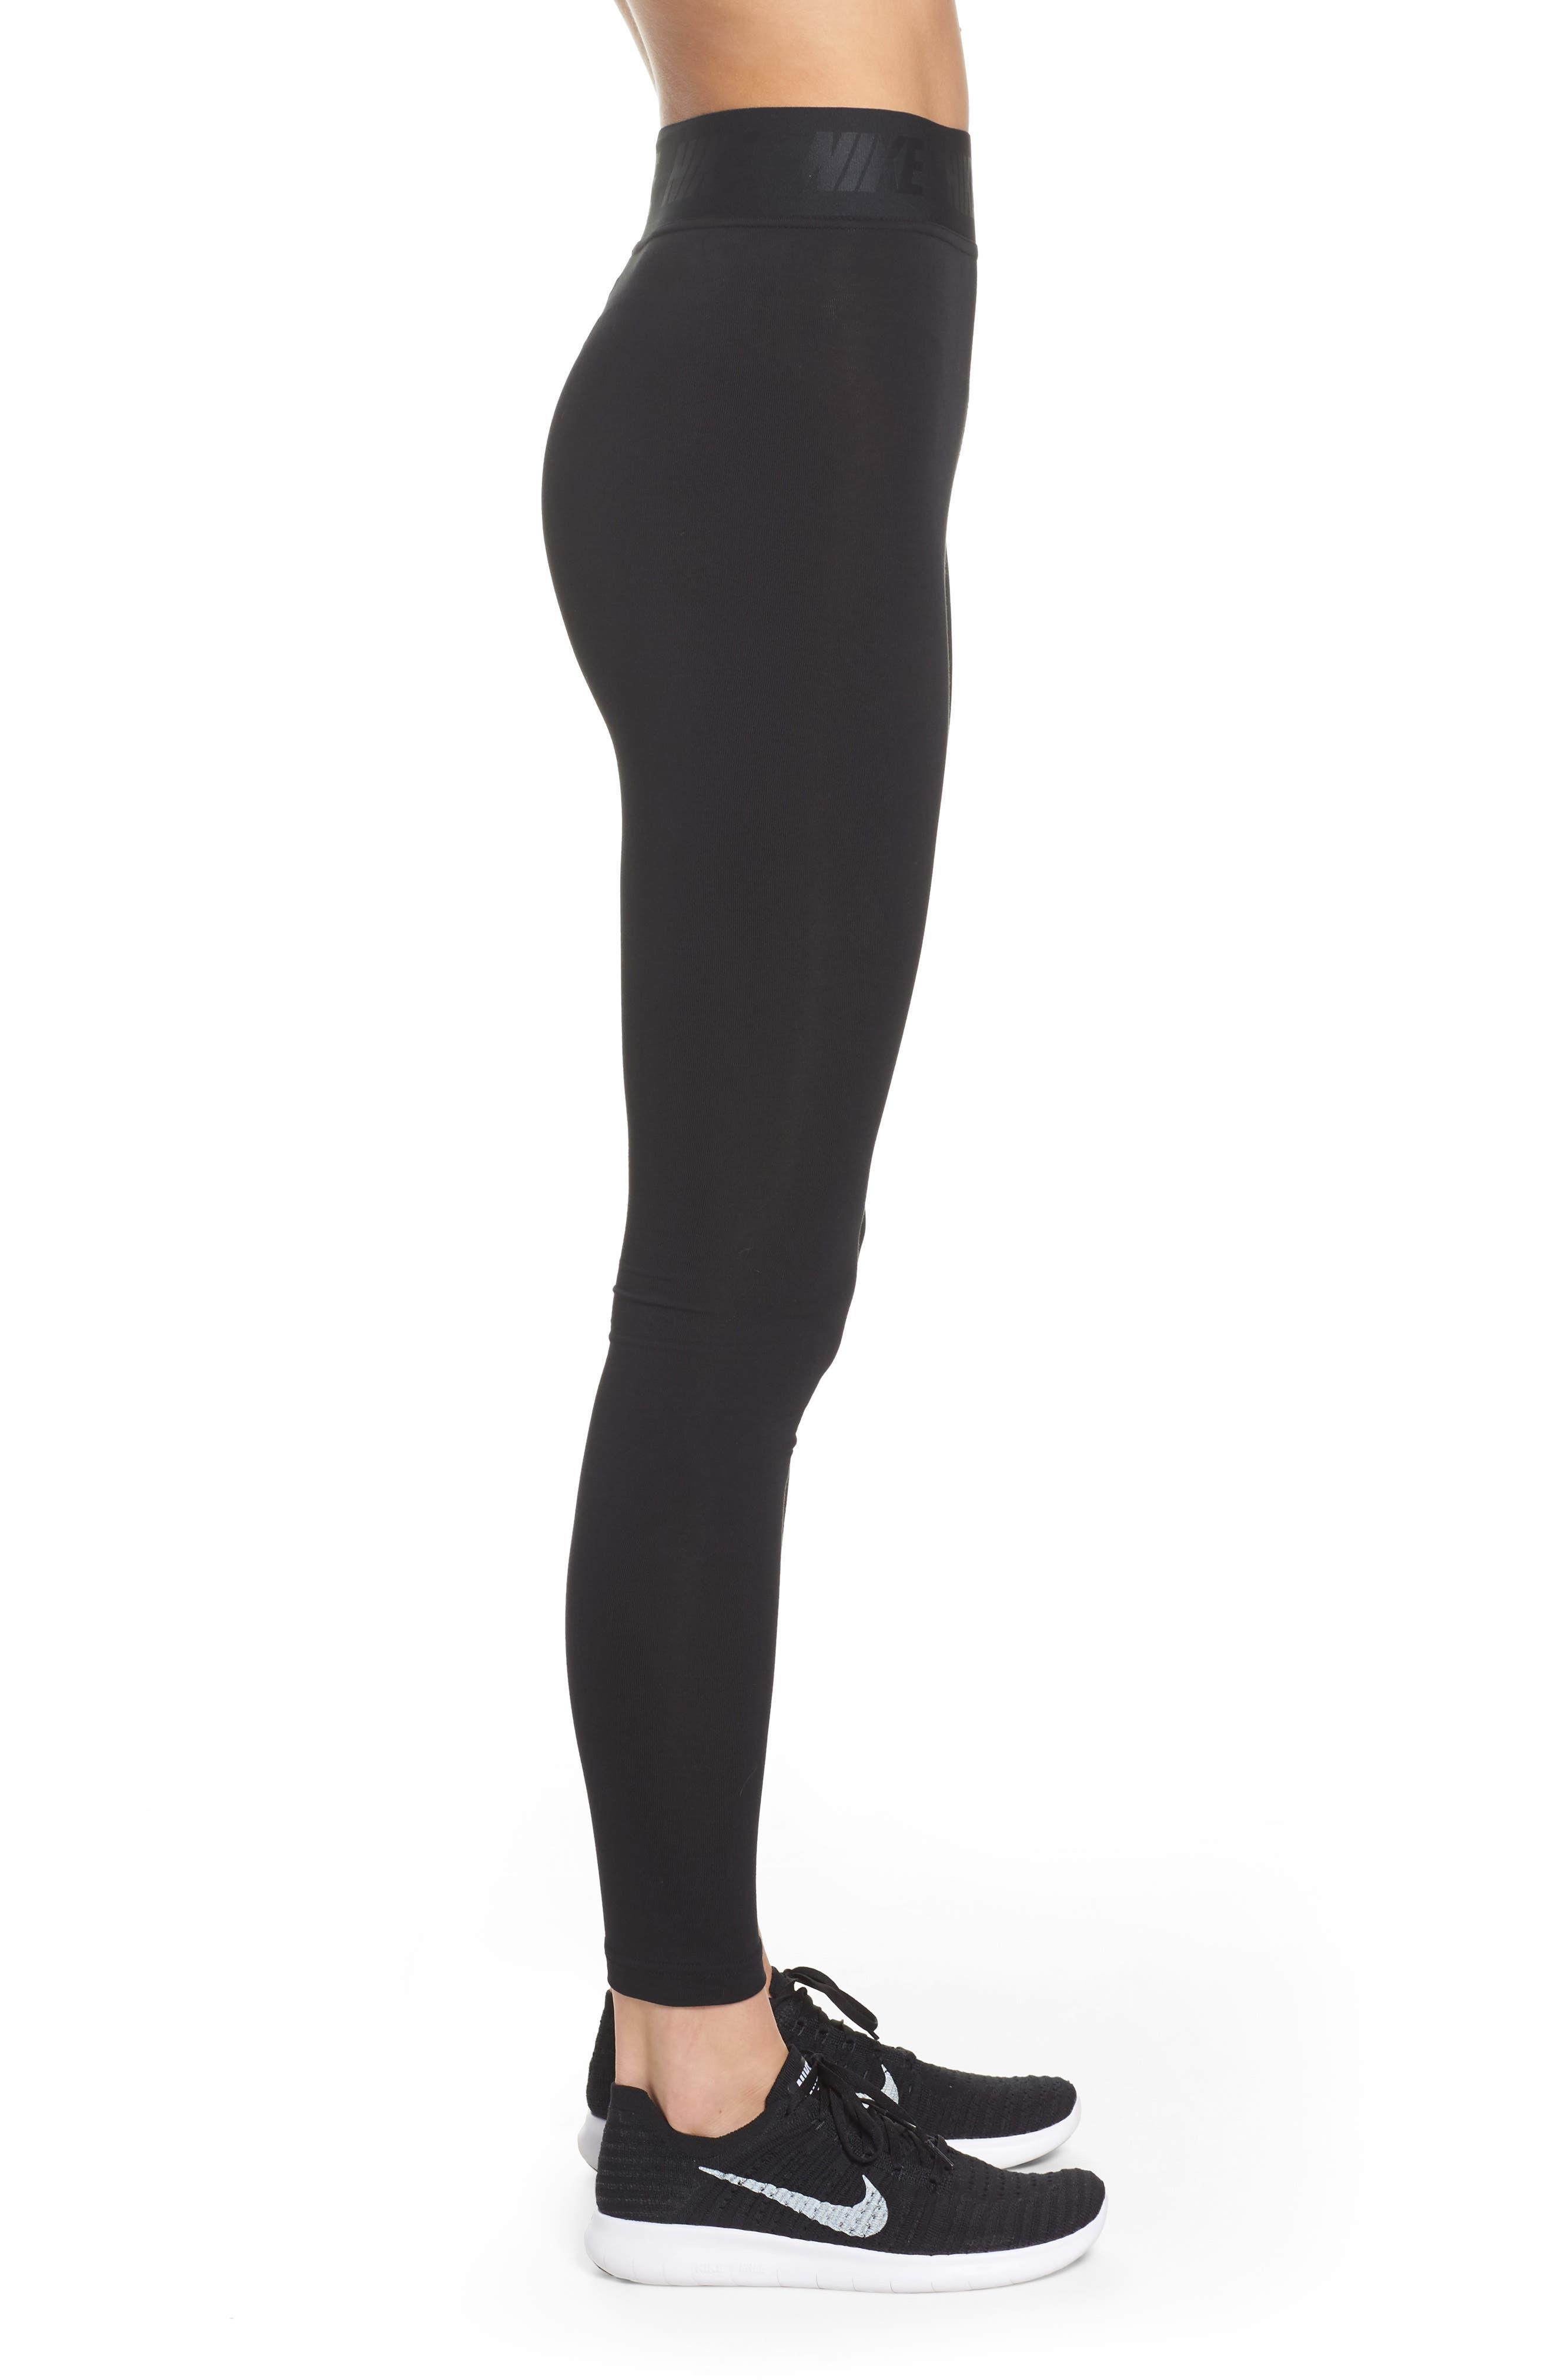 Leg-a-See High Waist Leggings,                             Alternate thumbnail 3, color,                             Black/ White